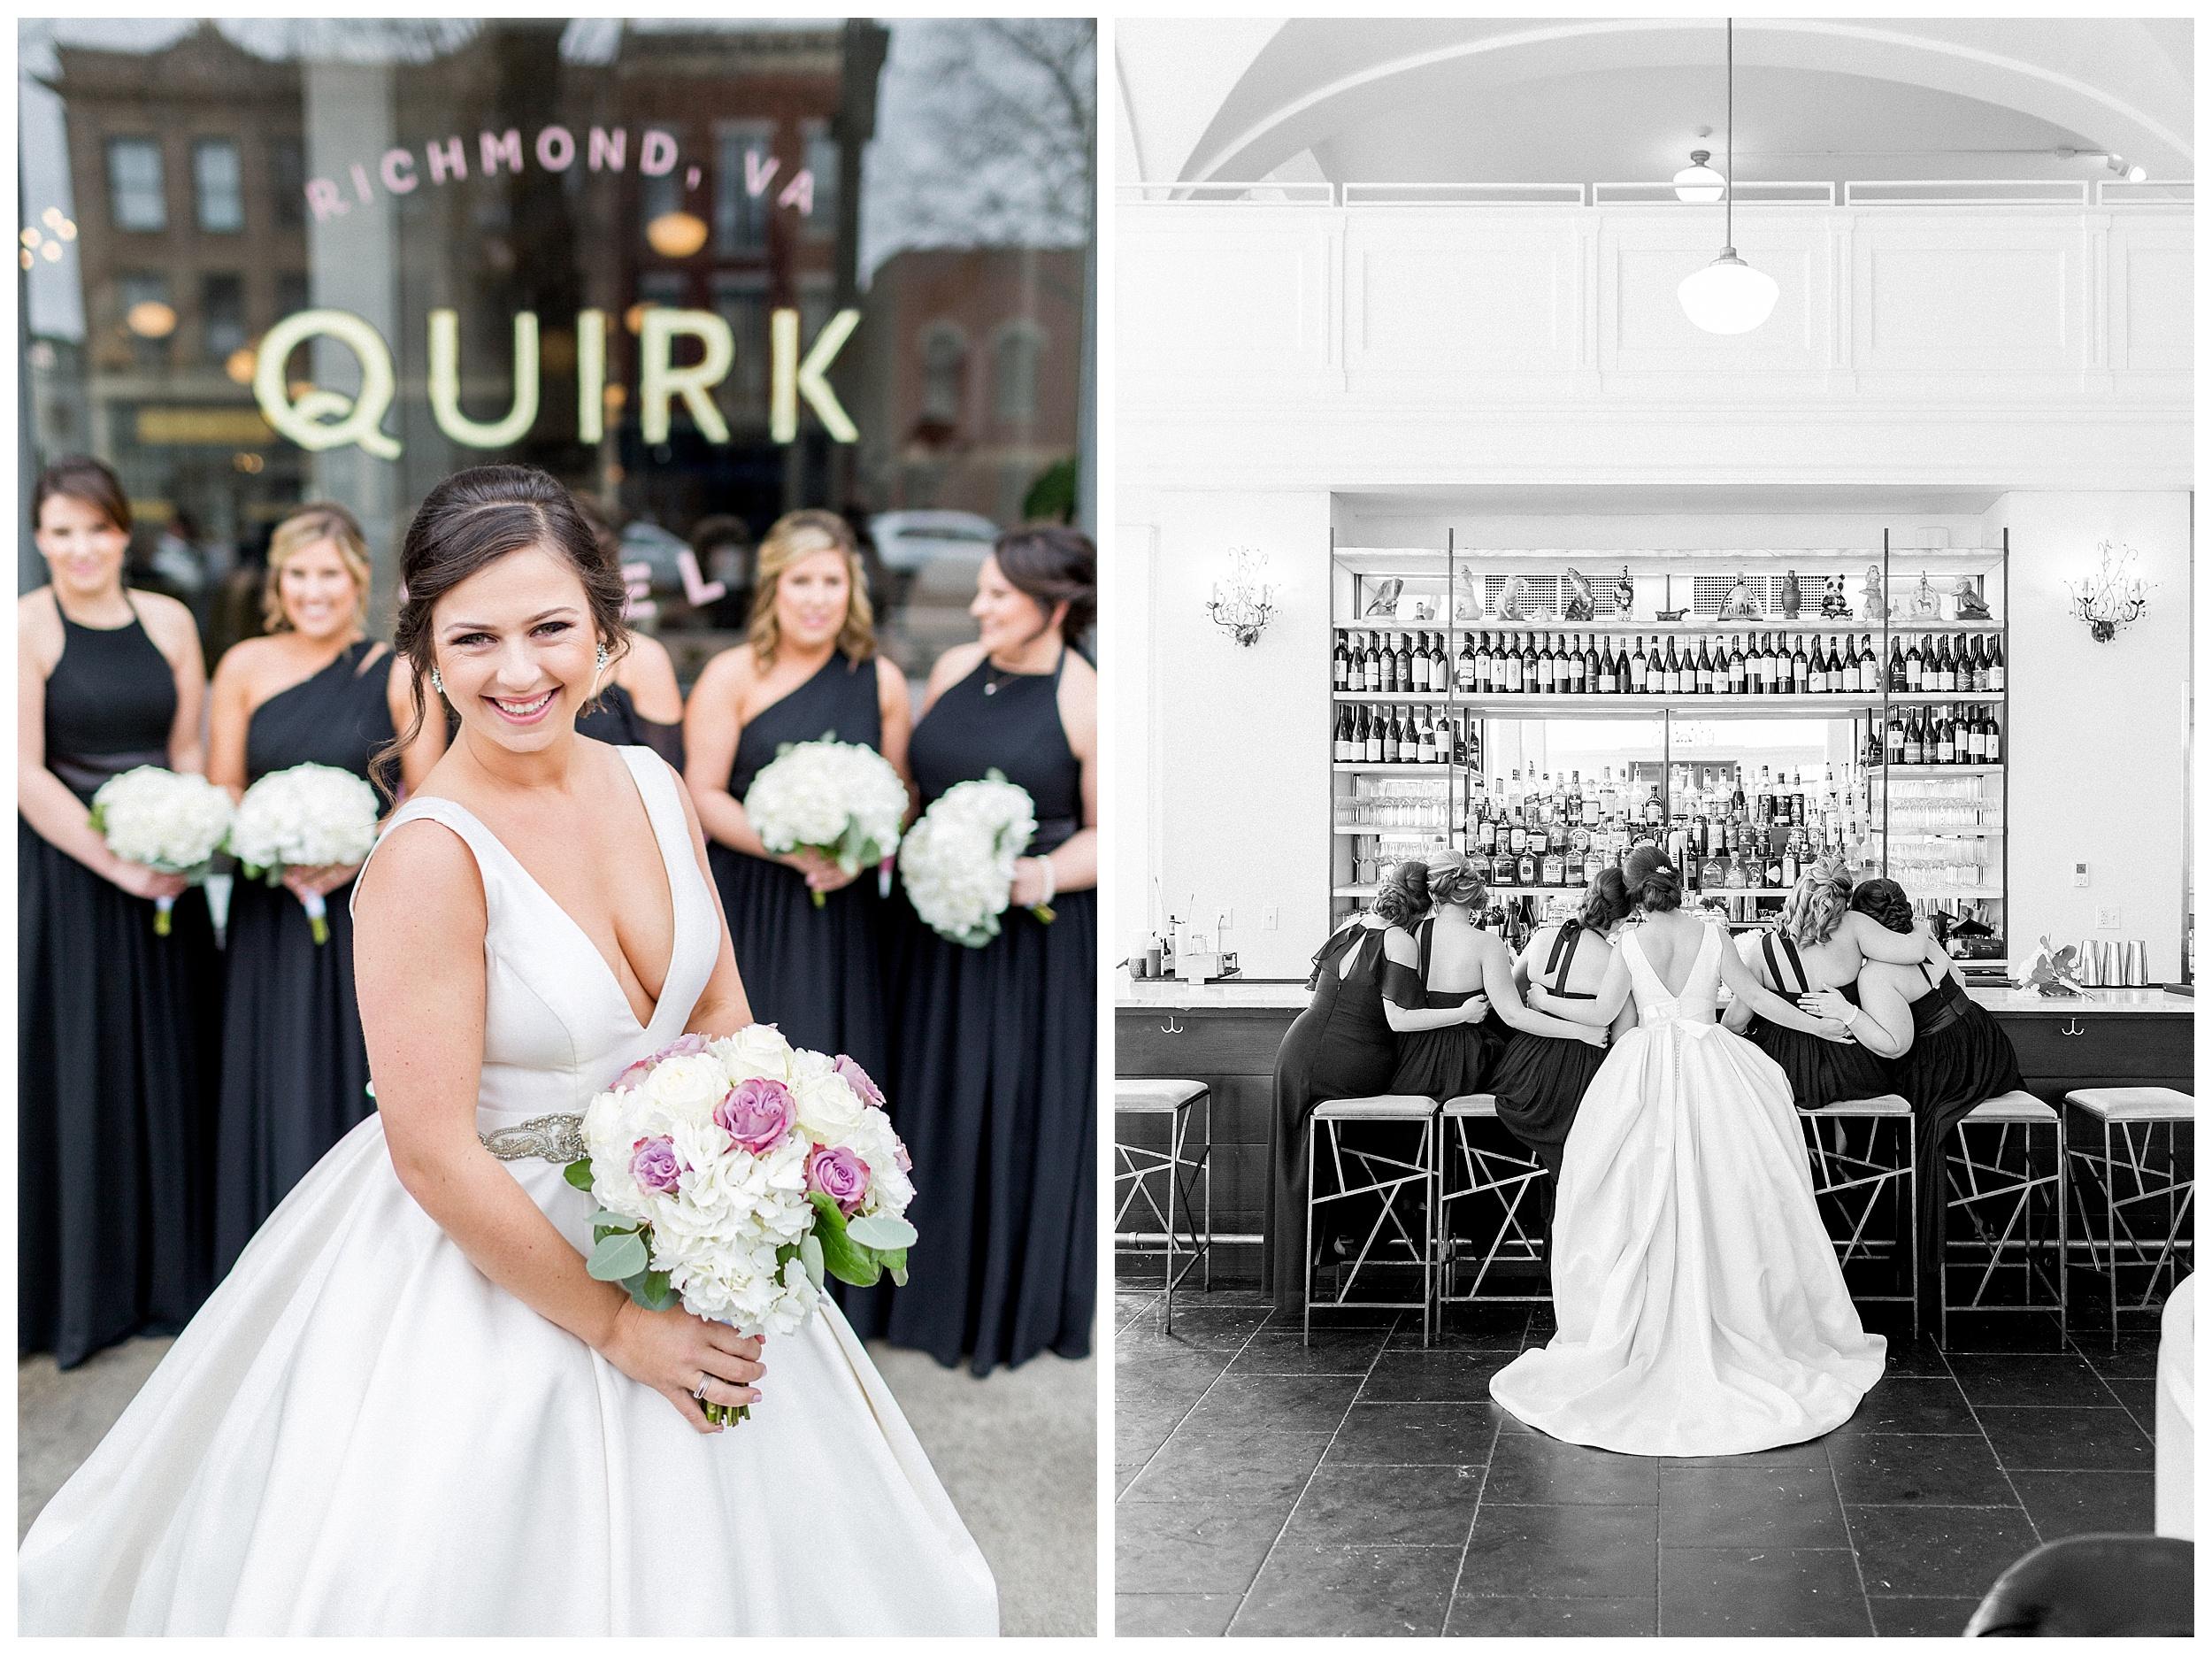 Country Club of Virginia Wedding | Richmond Wedding Photographer_0056.jpg